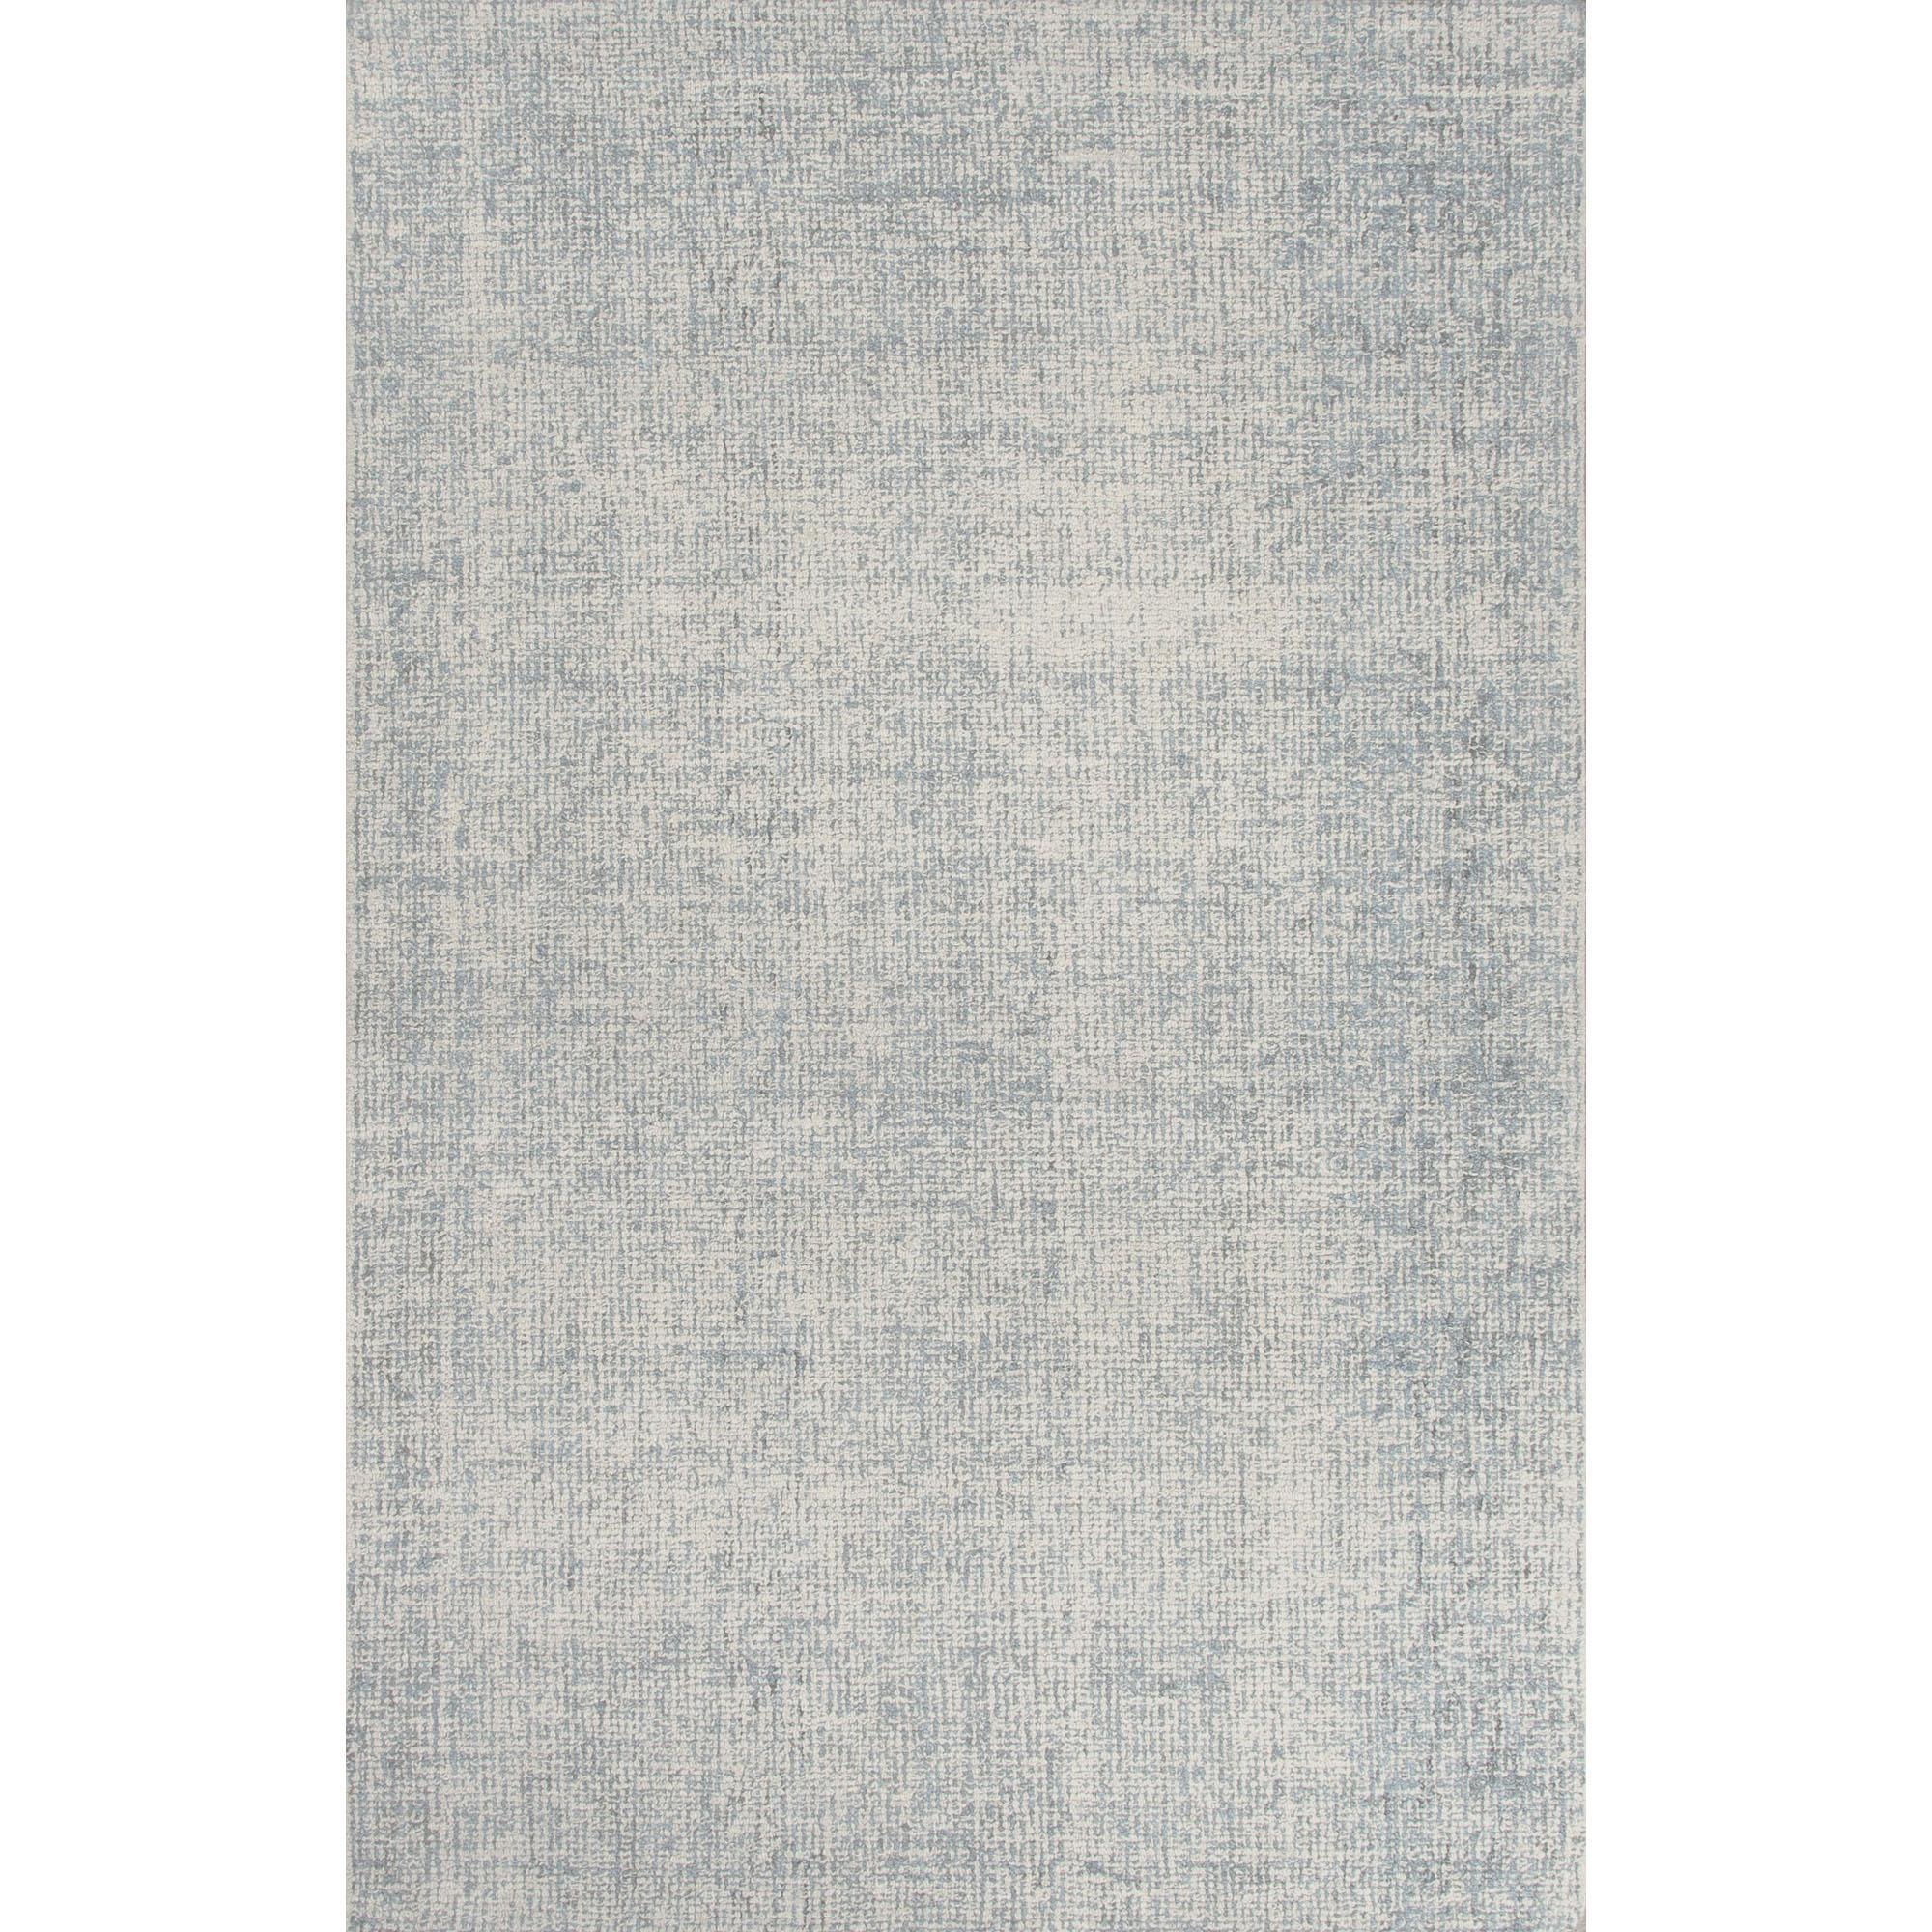 JAIPUR Rugs Britta 9 x 12 Rug - Item Number: RUG121981